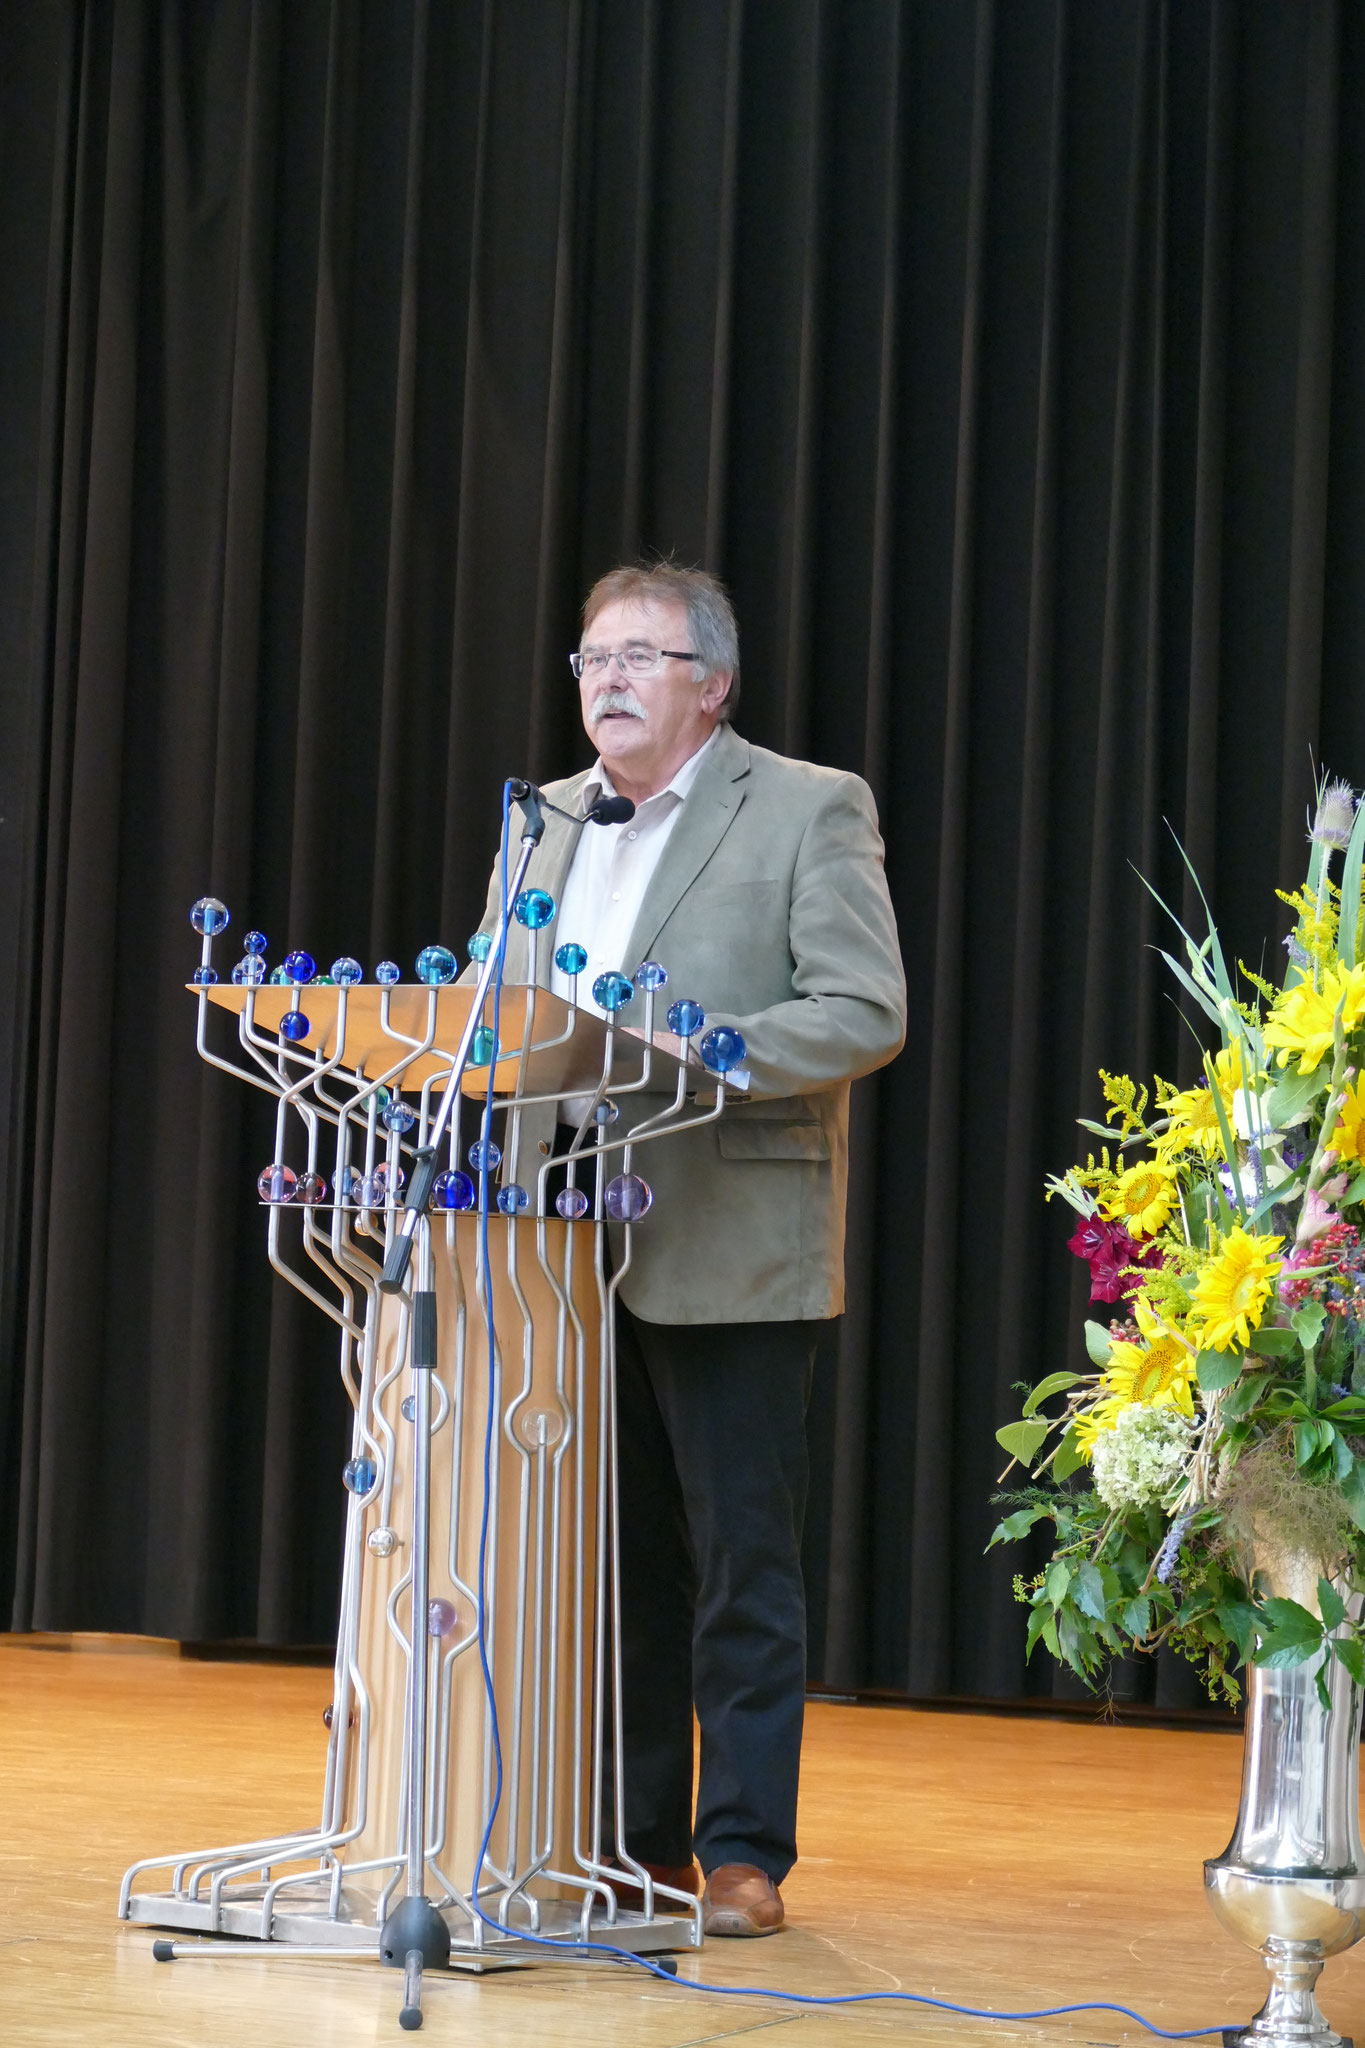 Grußwort des stellvertretenden Landrats Willibald Hogger